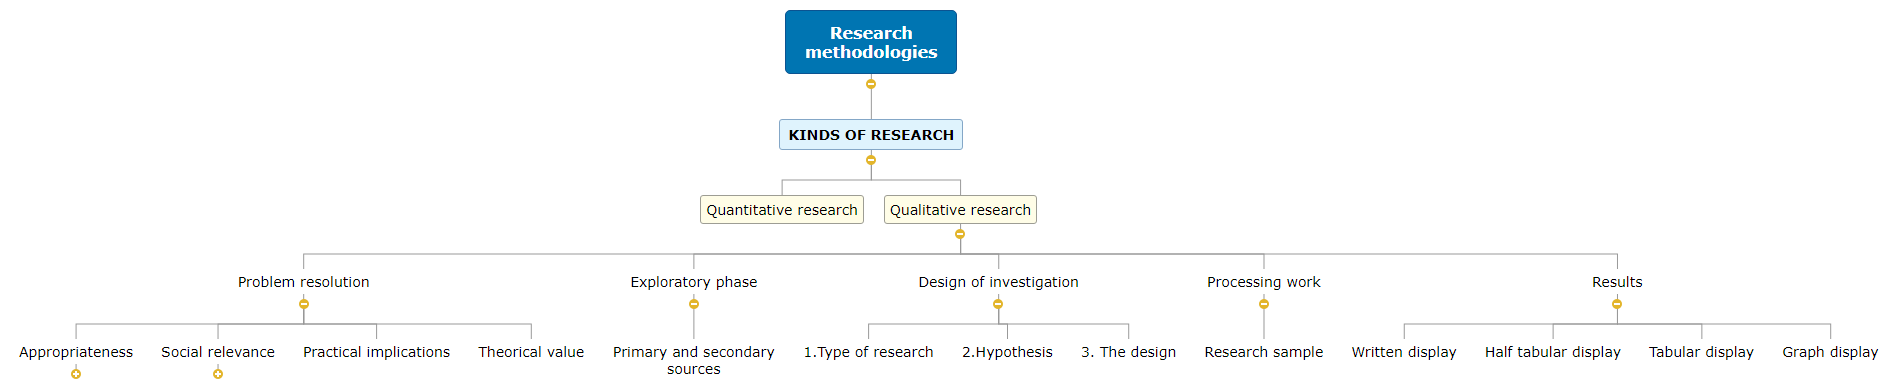 Research methodologies1 Mind Map